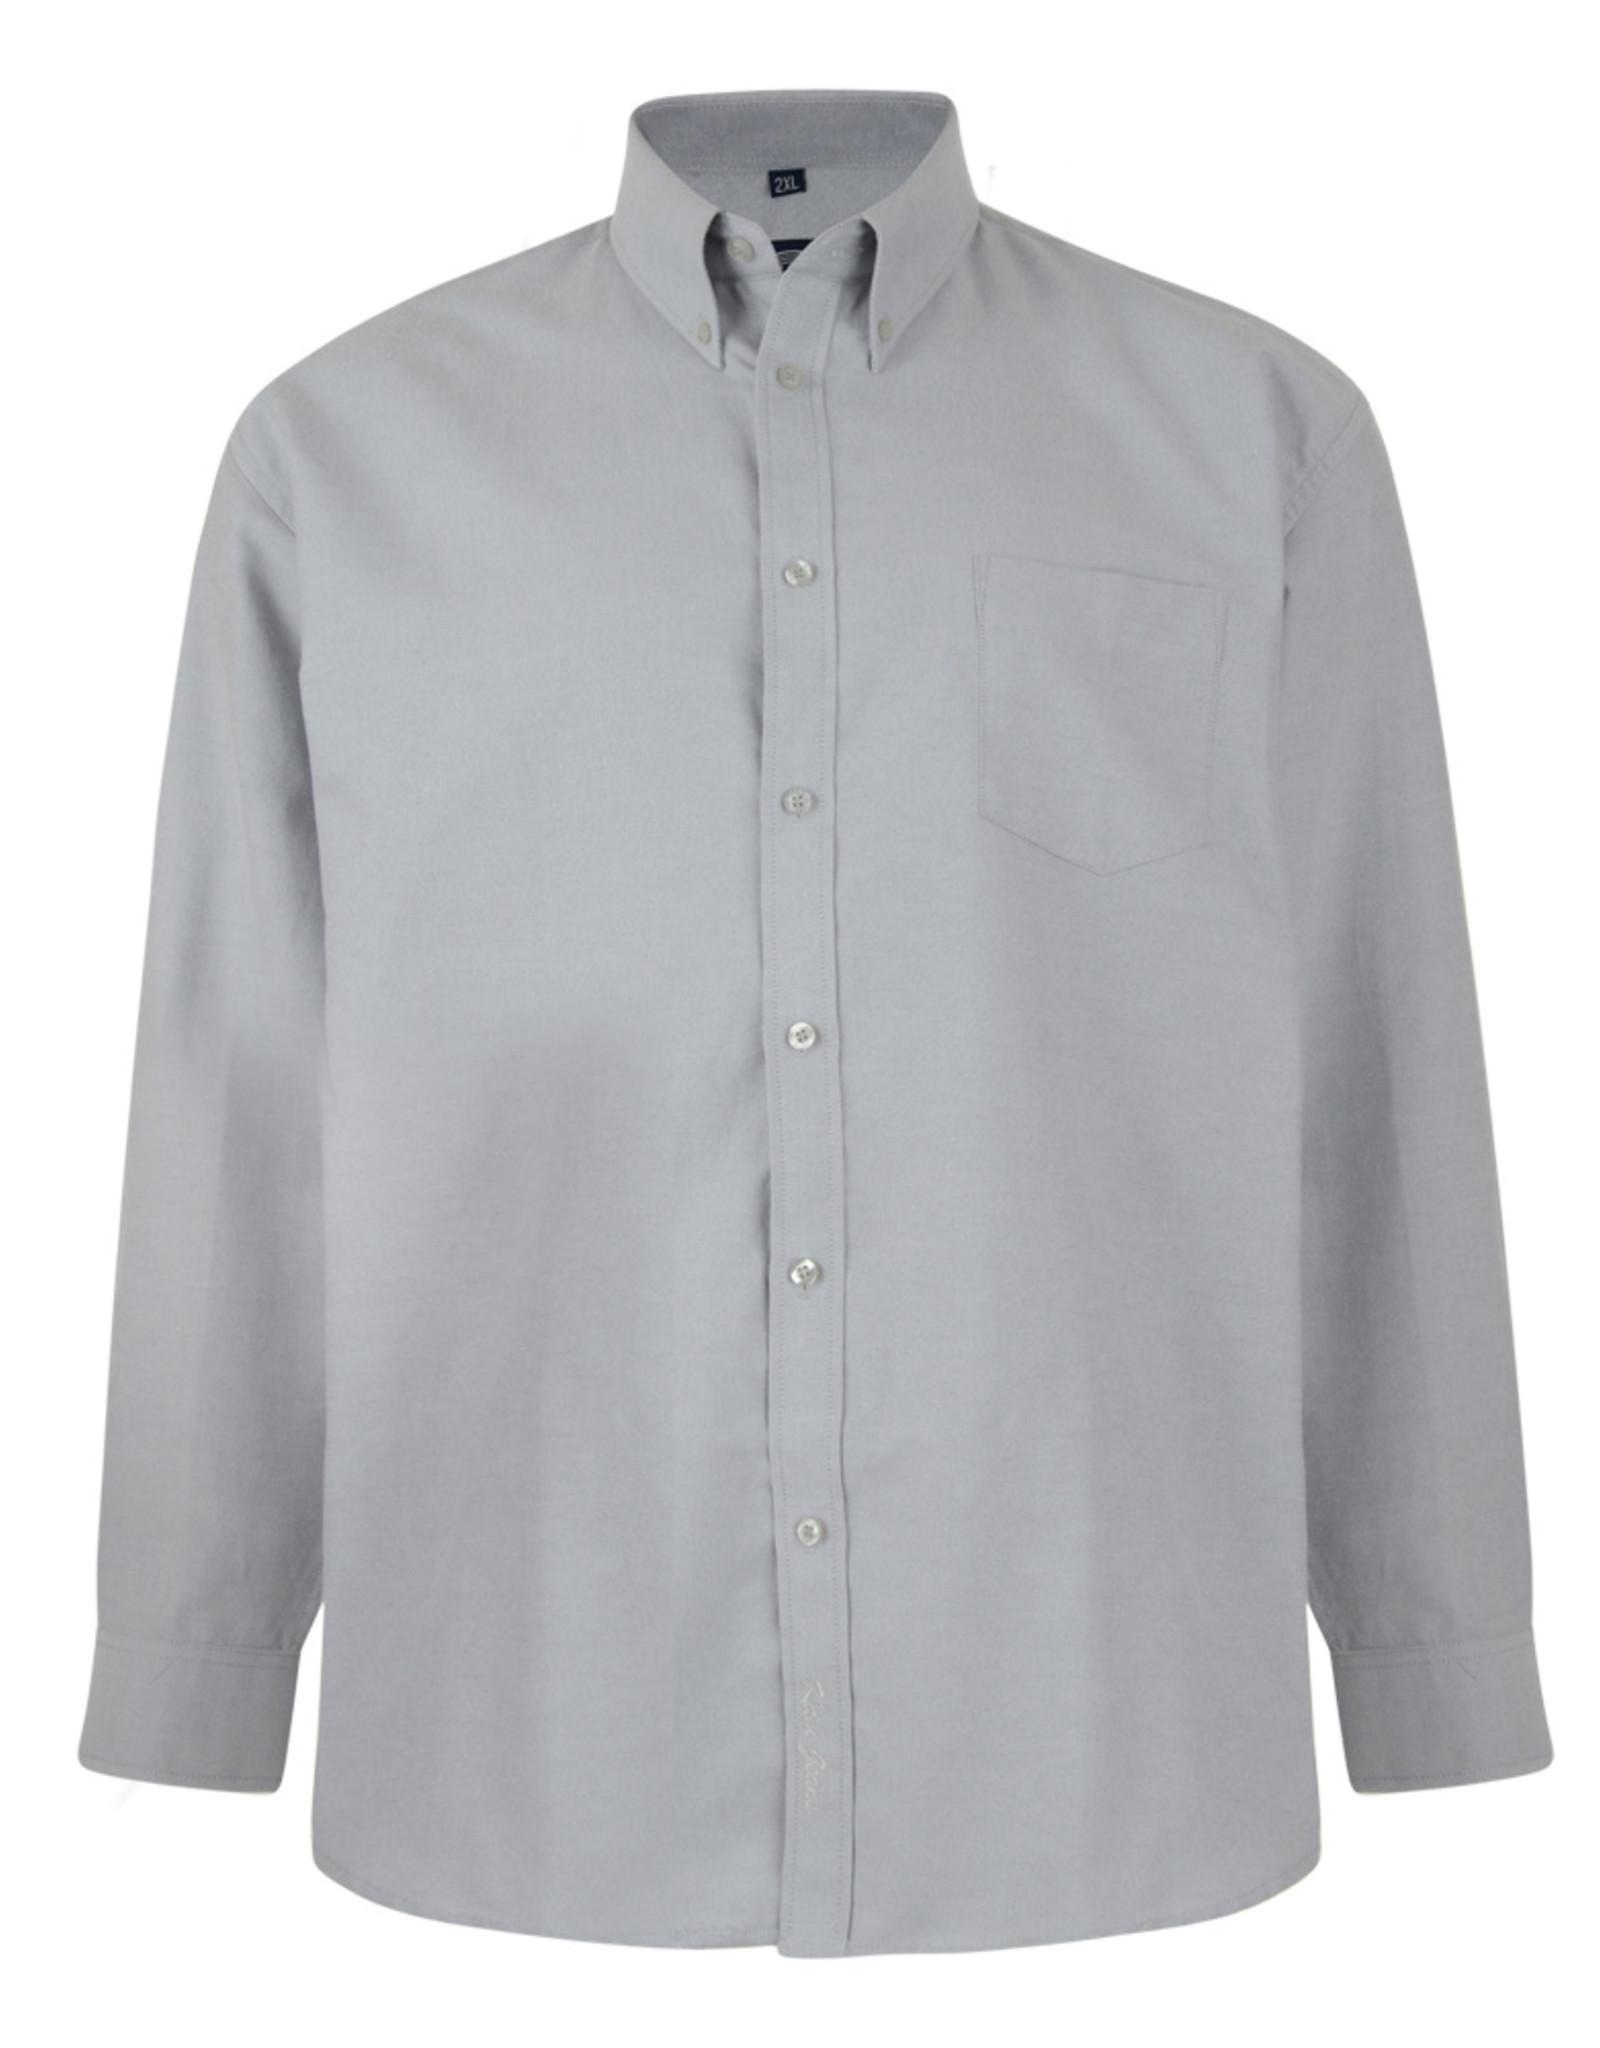 Kam Jeans OVERHEMD Oxford casual lange mouw grijs